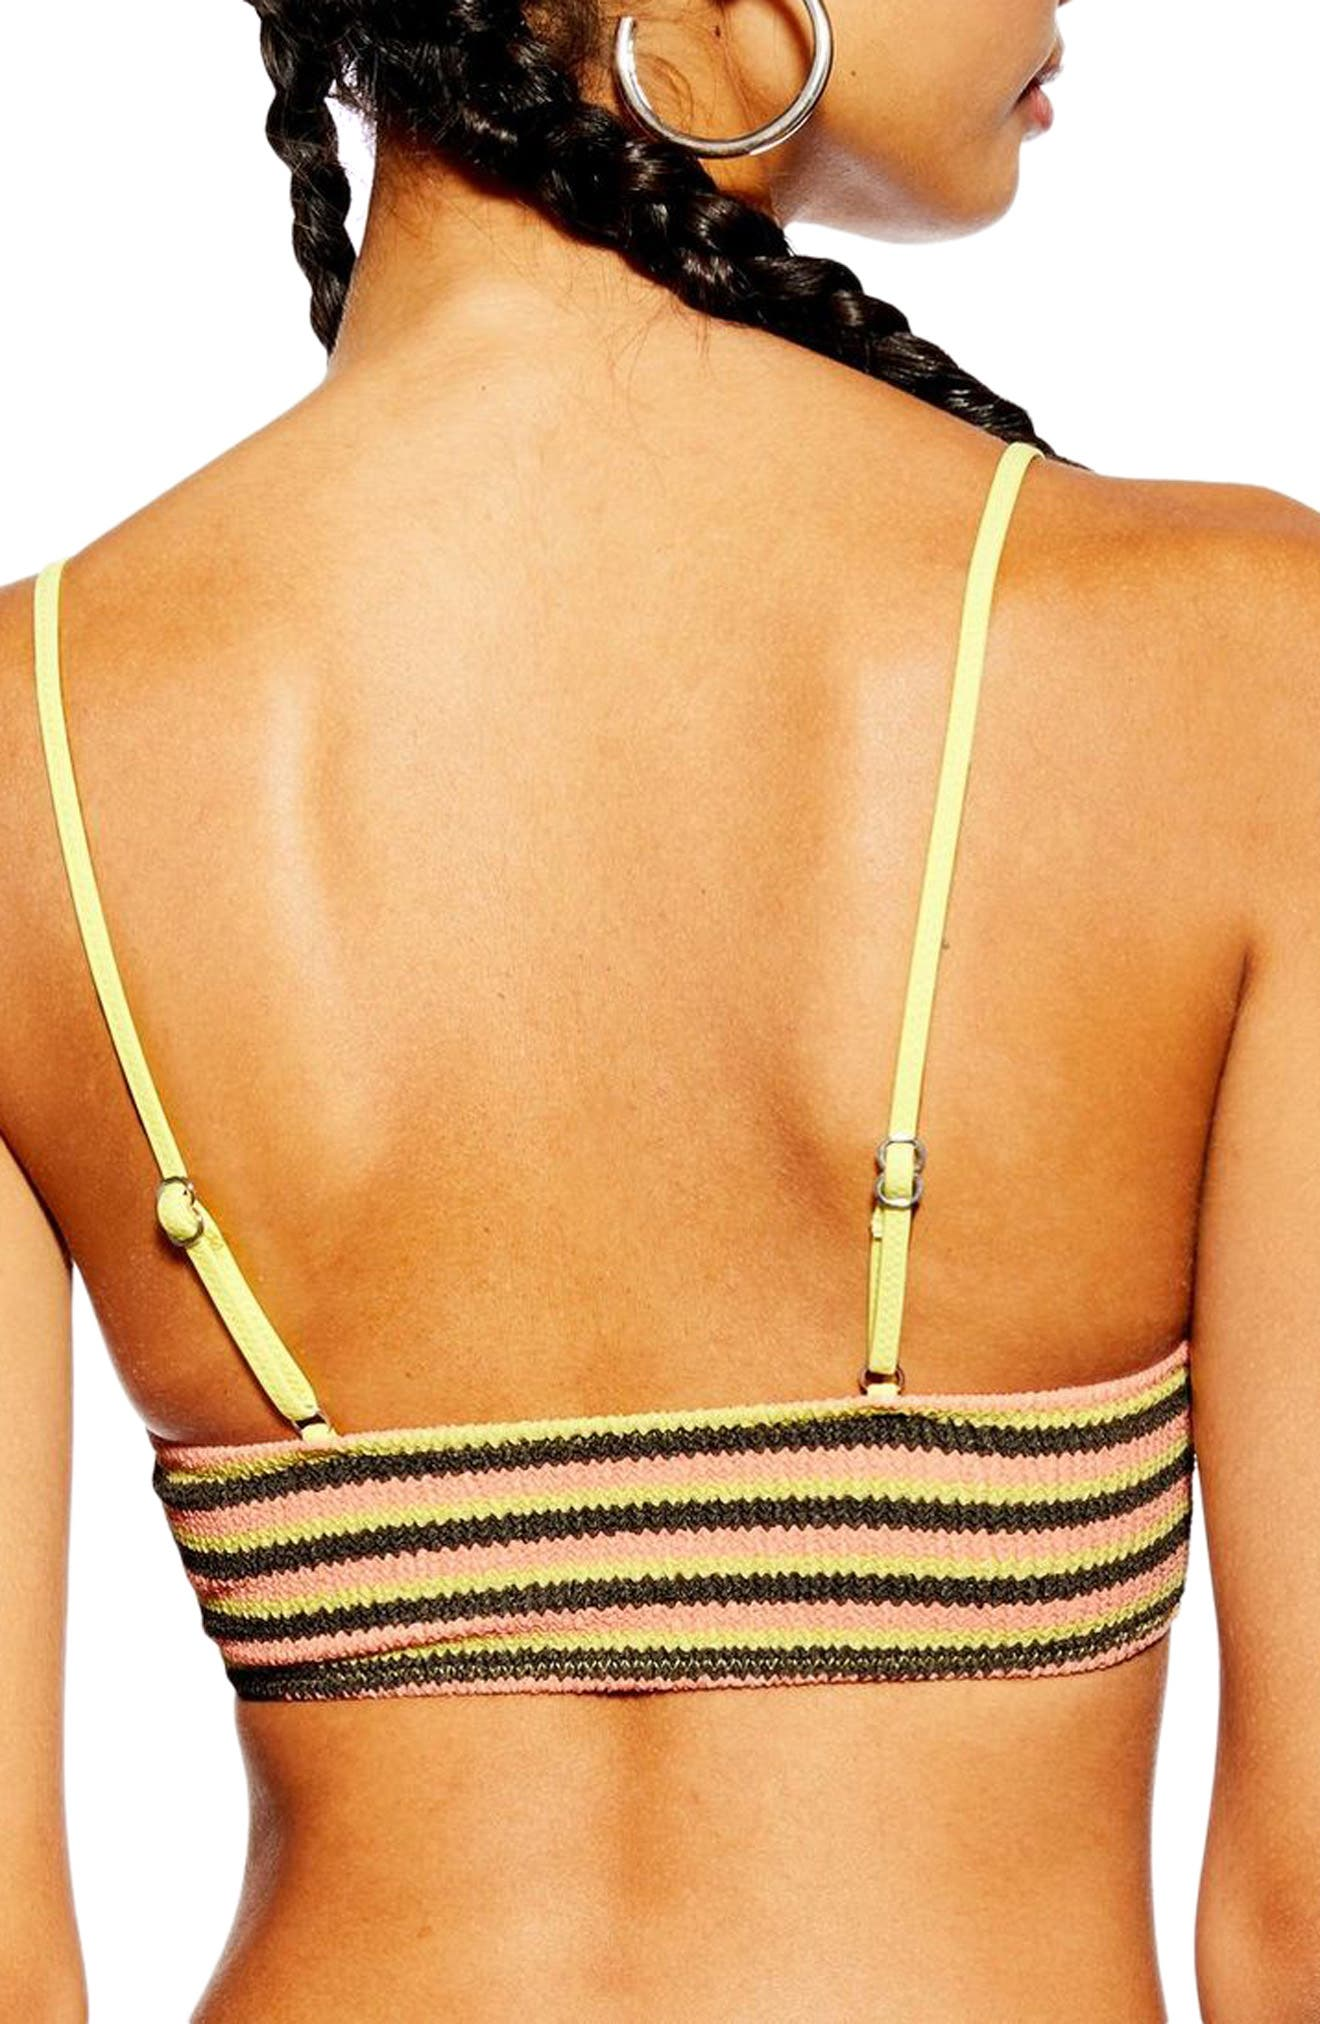 TOPSHOP, Textured Stripe Bikini Top, Alternate thumbnail 2, color, YELLOW MULTI